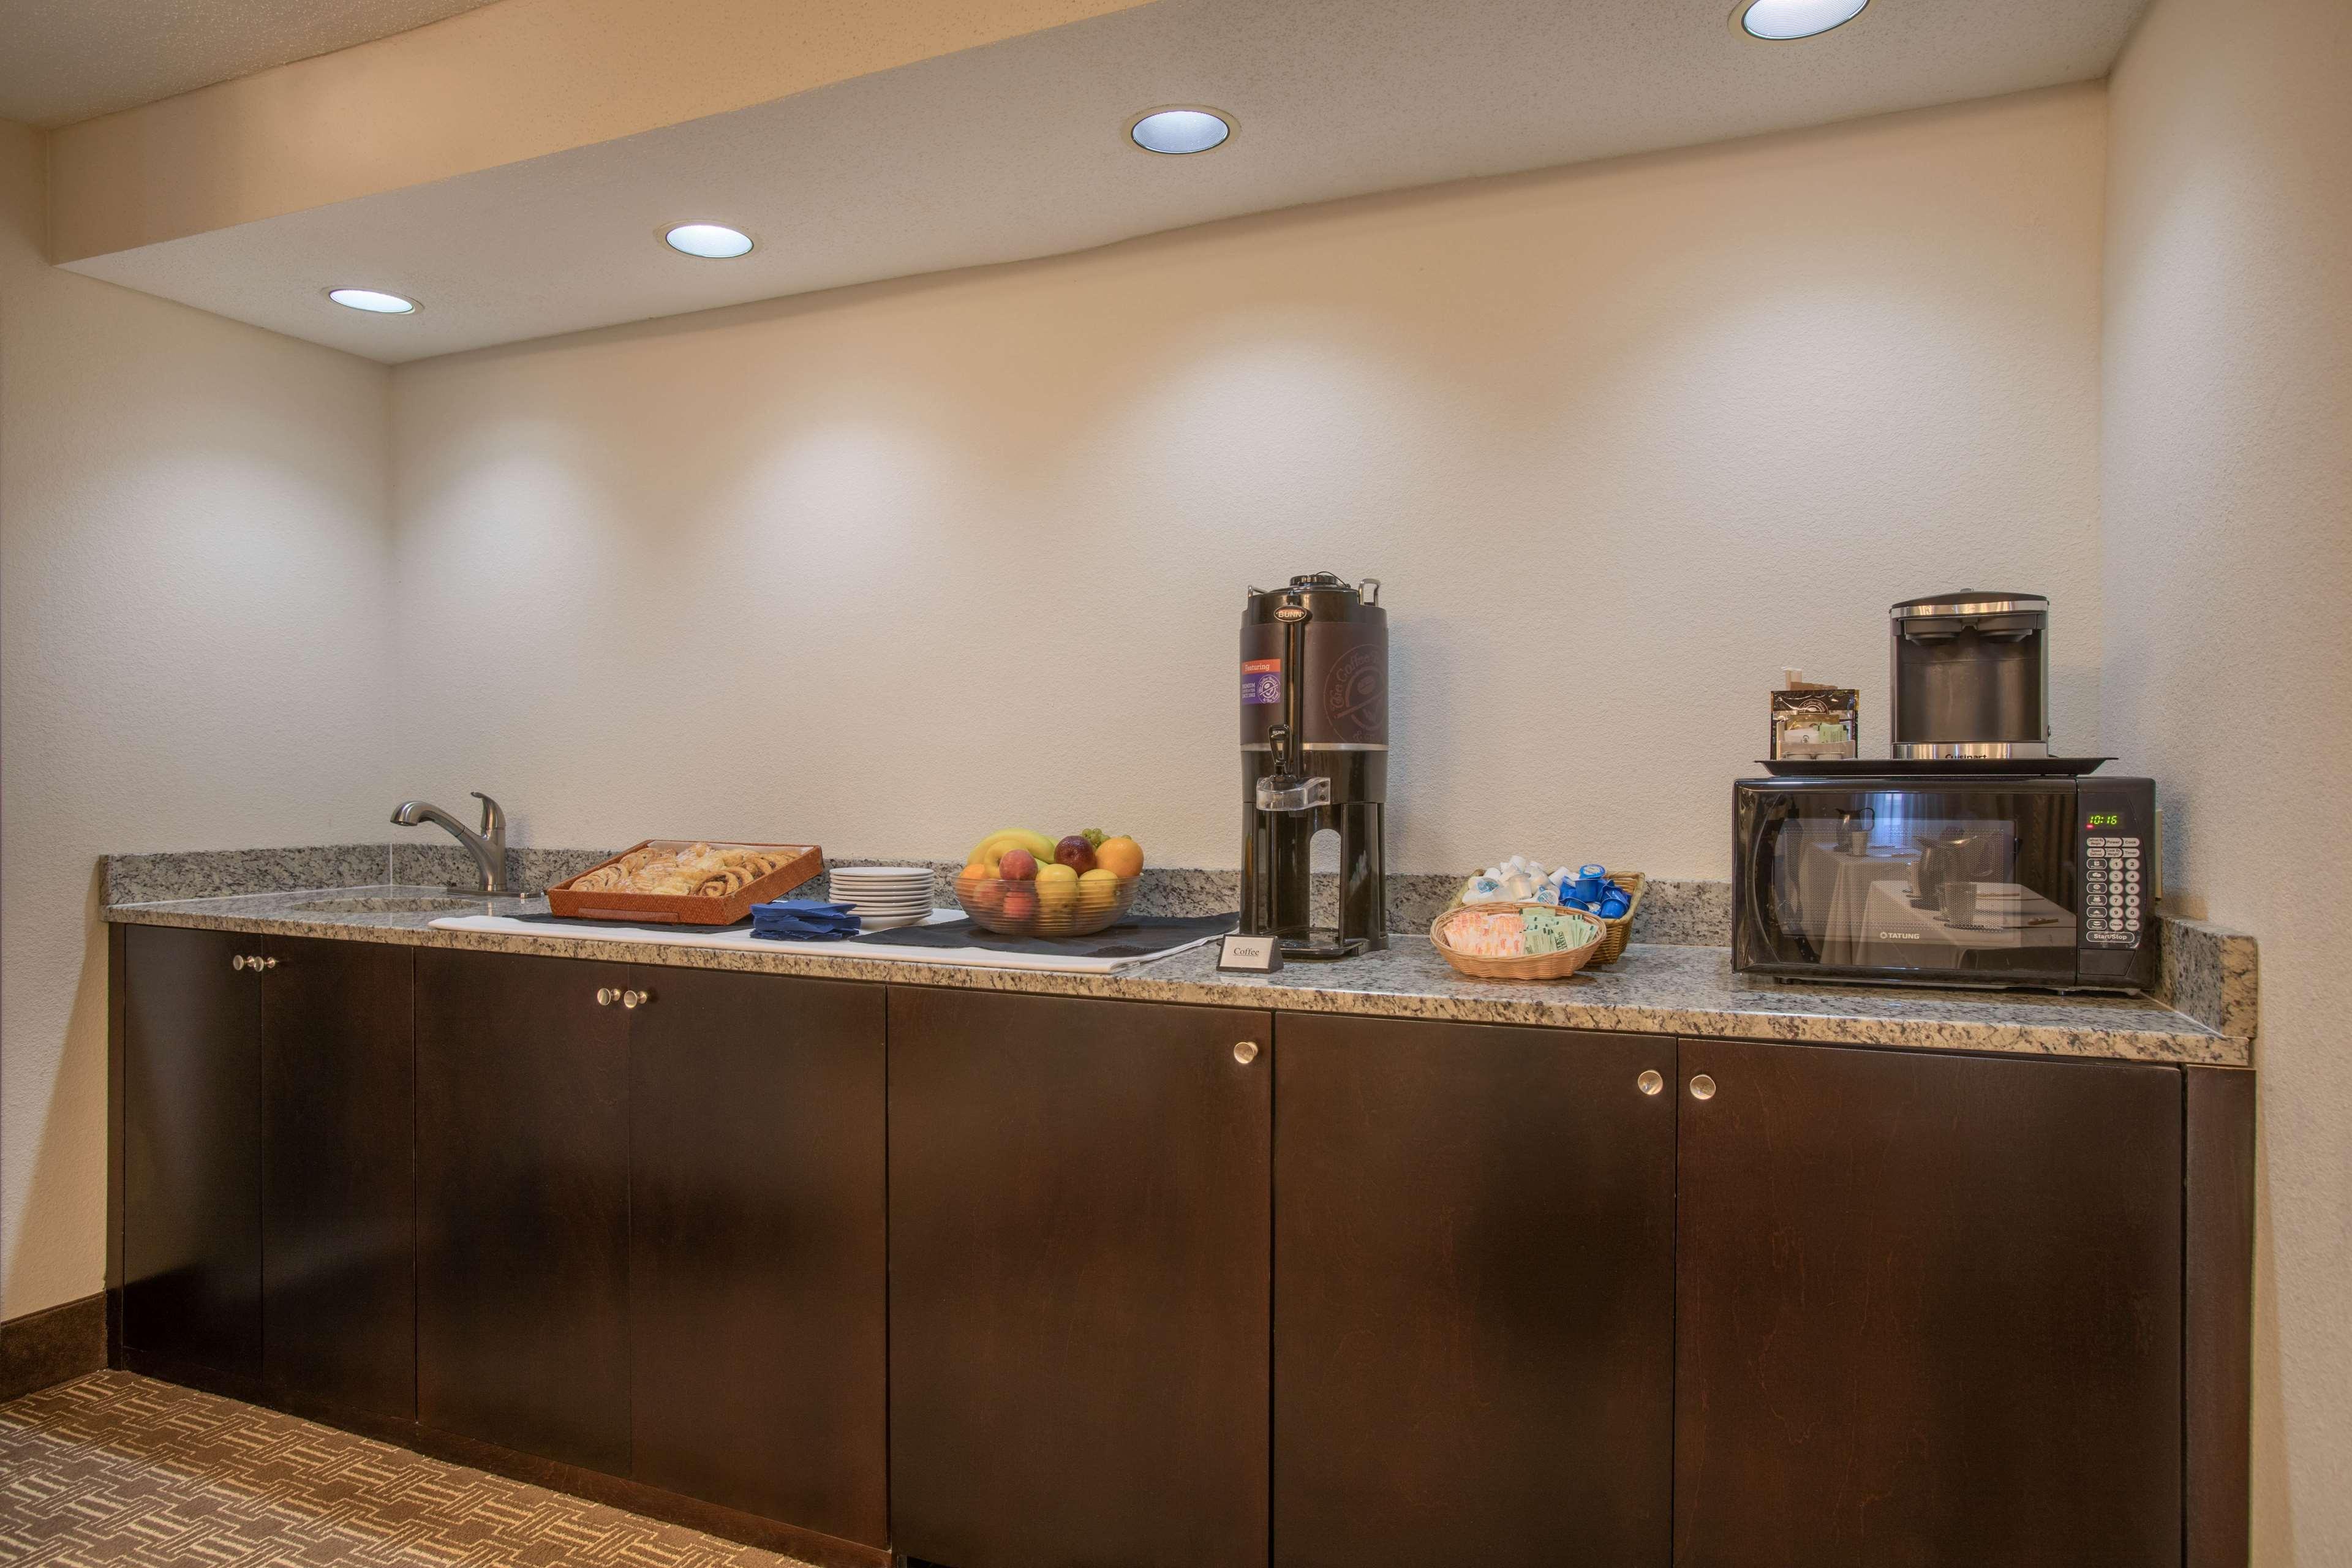 DoubleTree Suites by Hilton Hotel Nashville Airport image 44